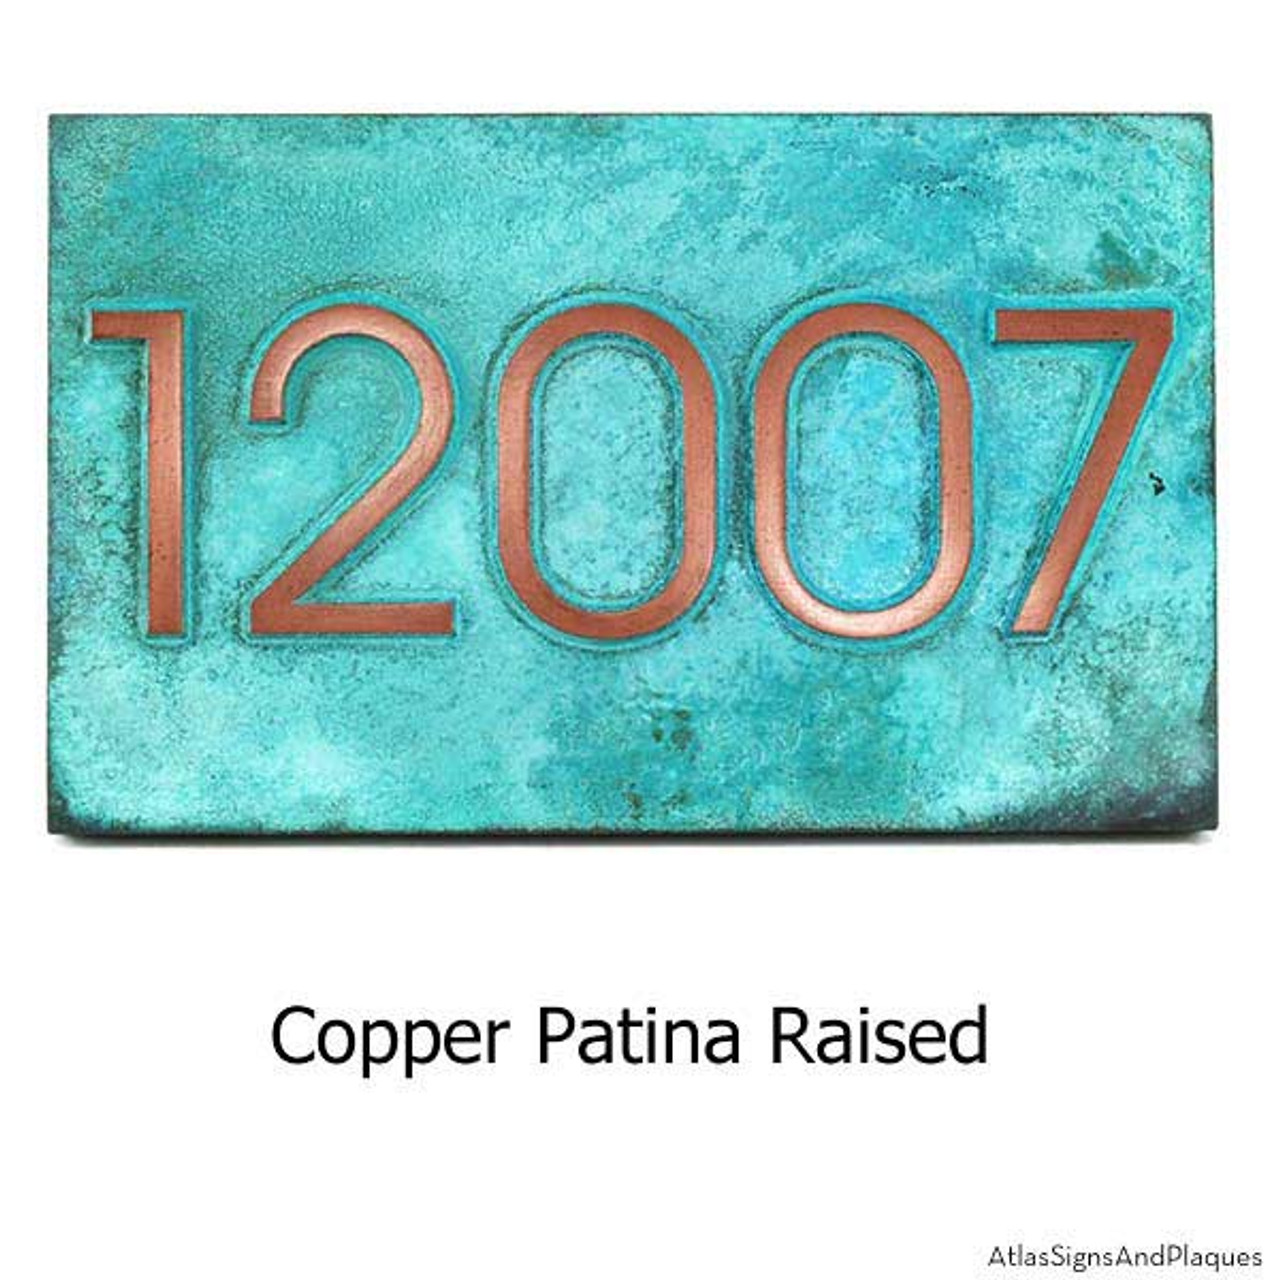 Modern Advantage House Number Plaque shown in 'Copper Verdi' finish.